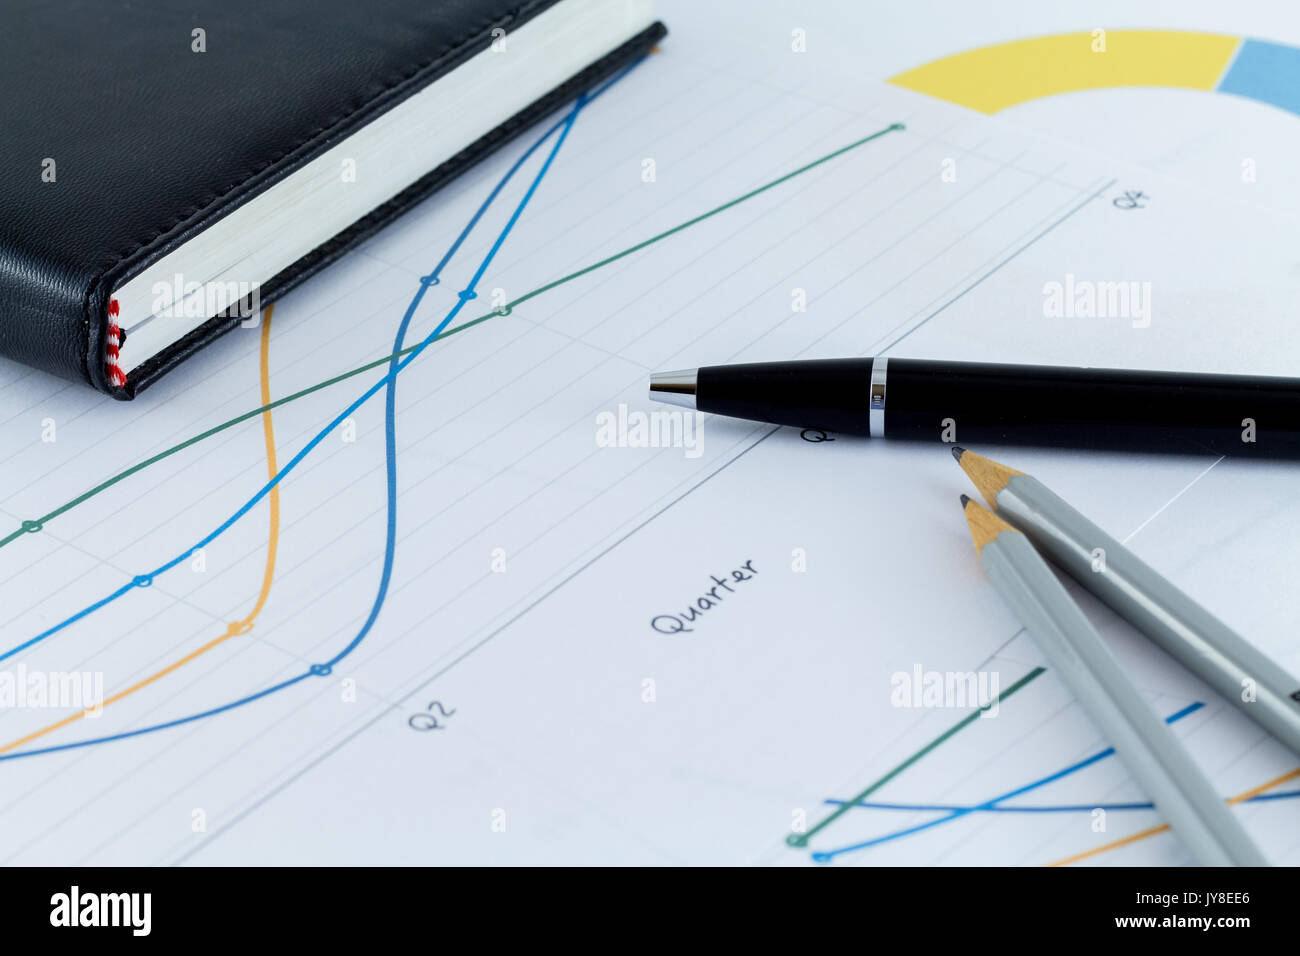 finance sheet charts office business man workspace desk with pen